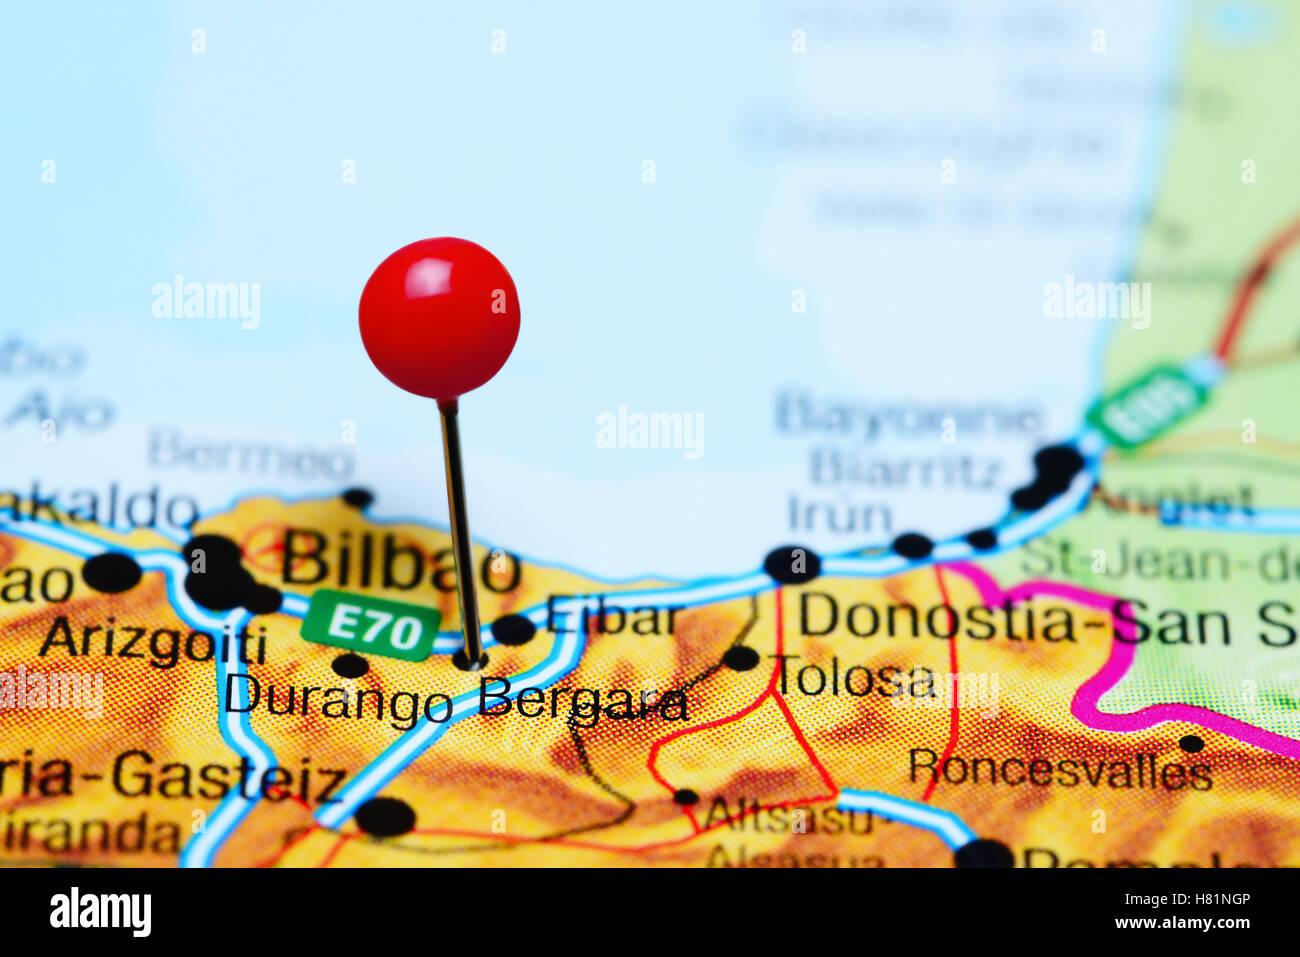 Map Of Spain Eibar.Bergara Pinned On A Map Of Spain Stock Photo 125428710 Alamy